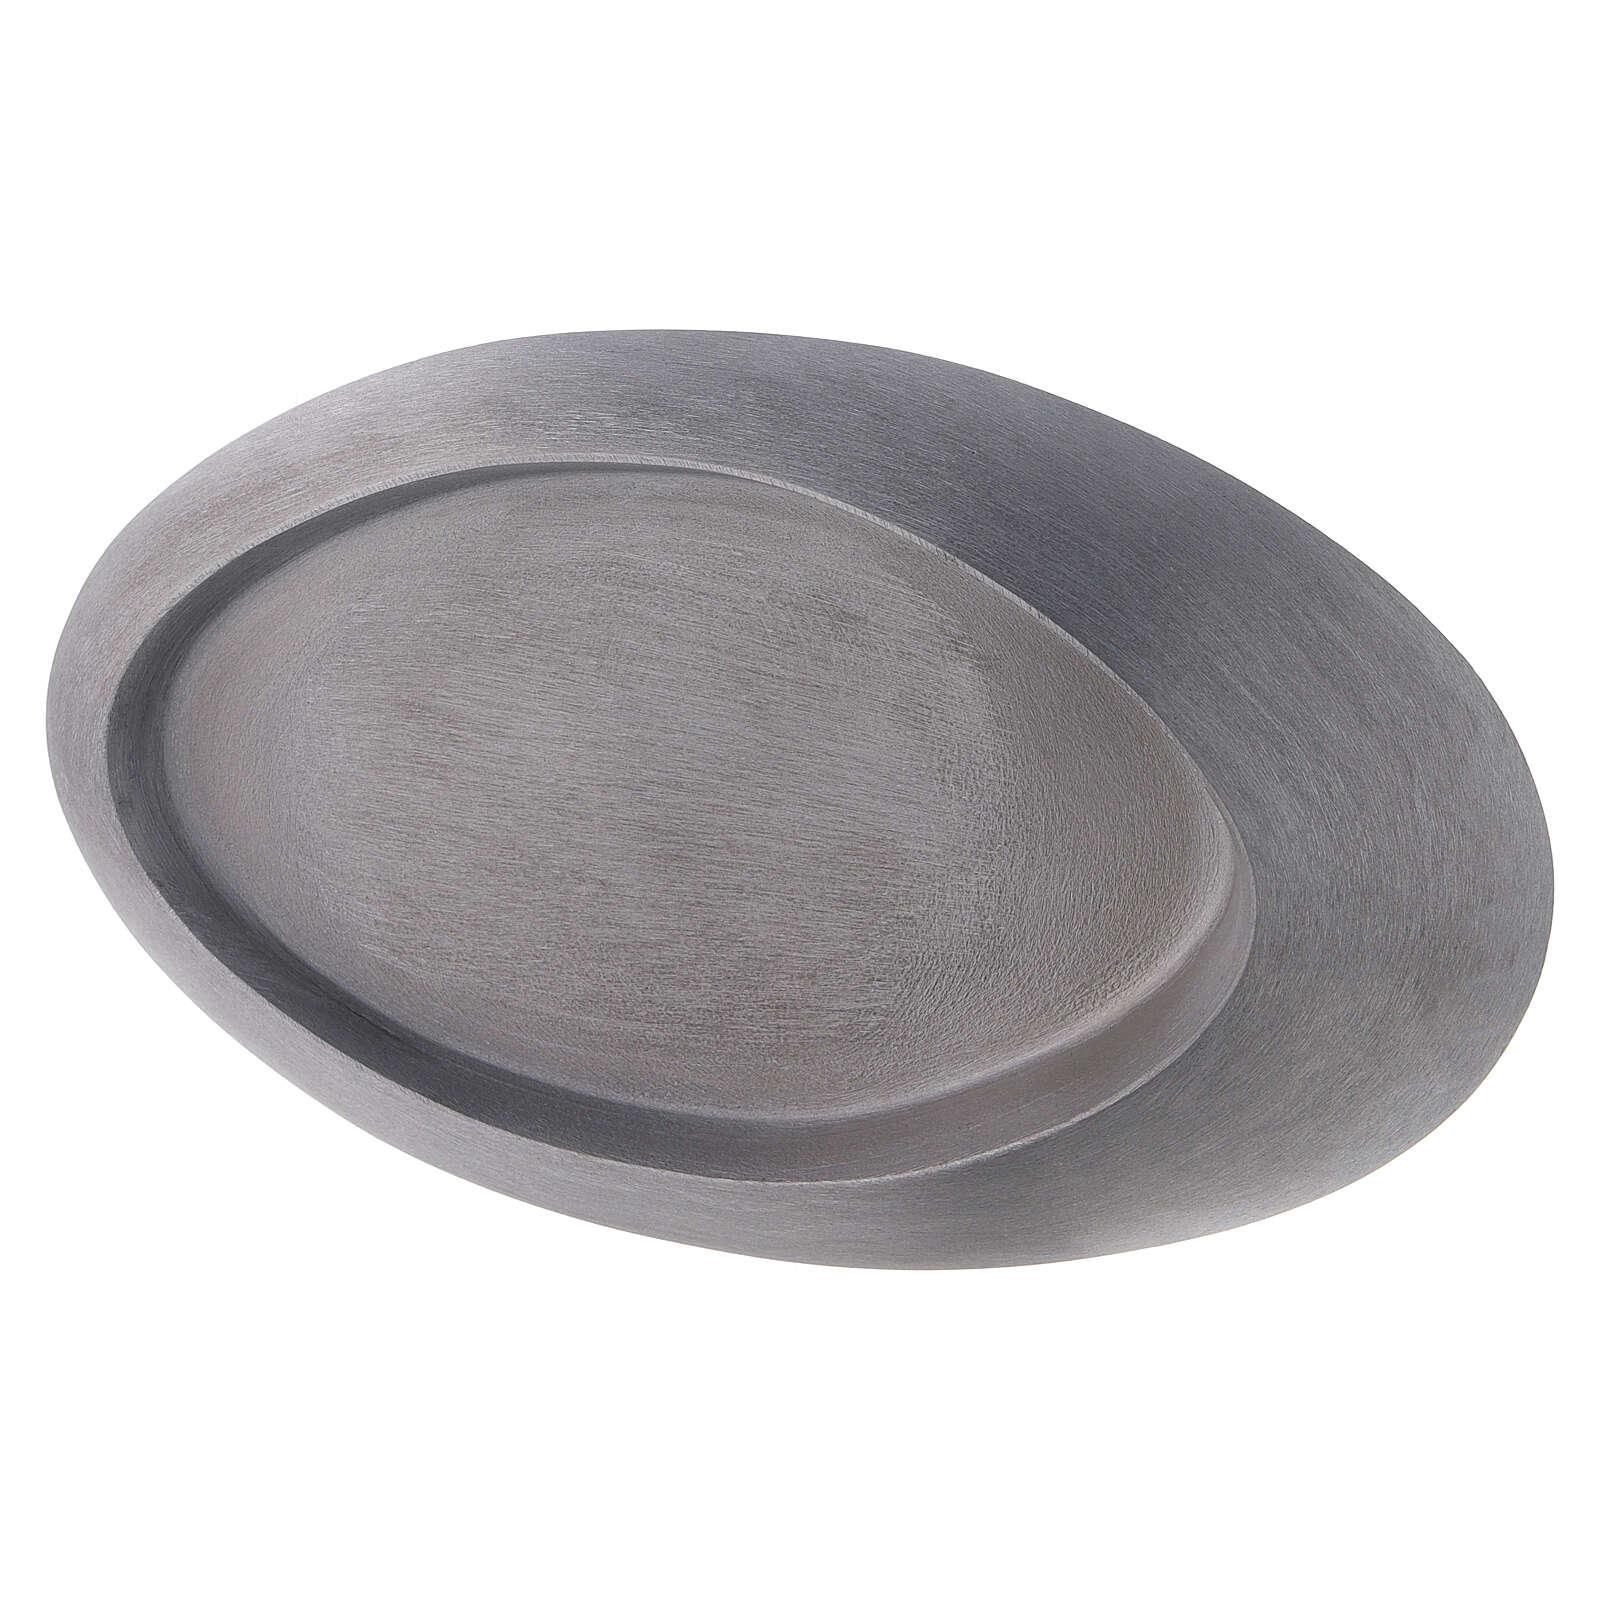 Portavela elevado ovalado aluminio lúcido 13x8 cm 3